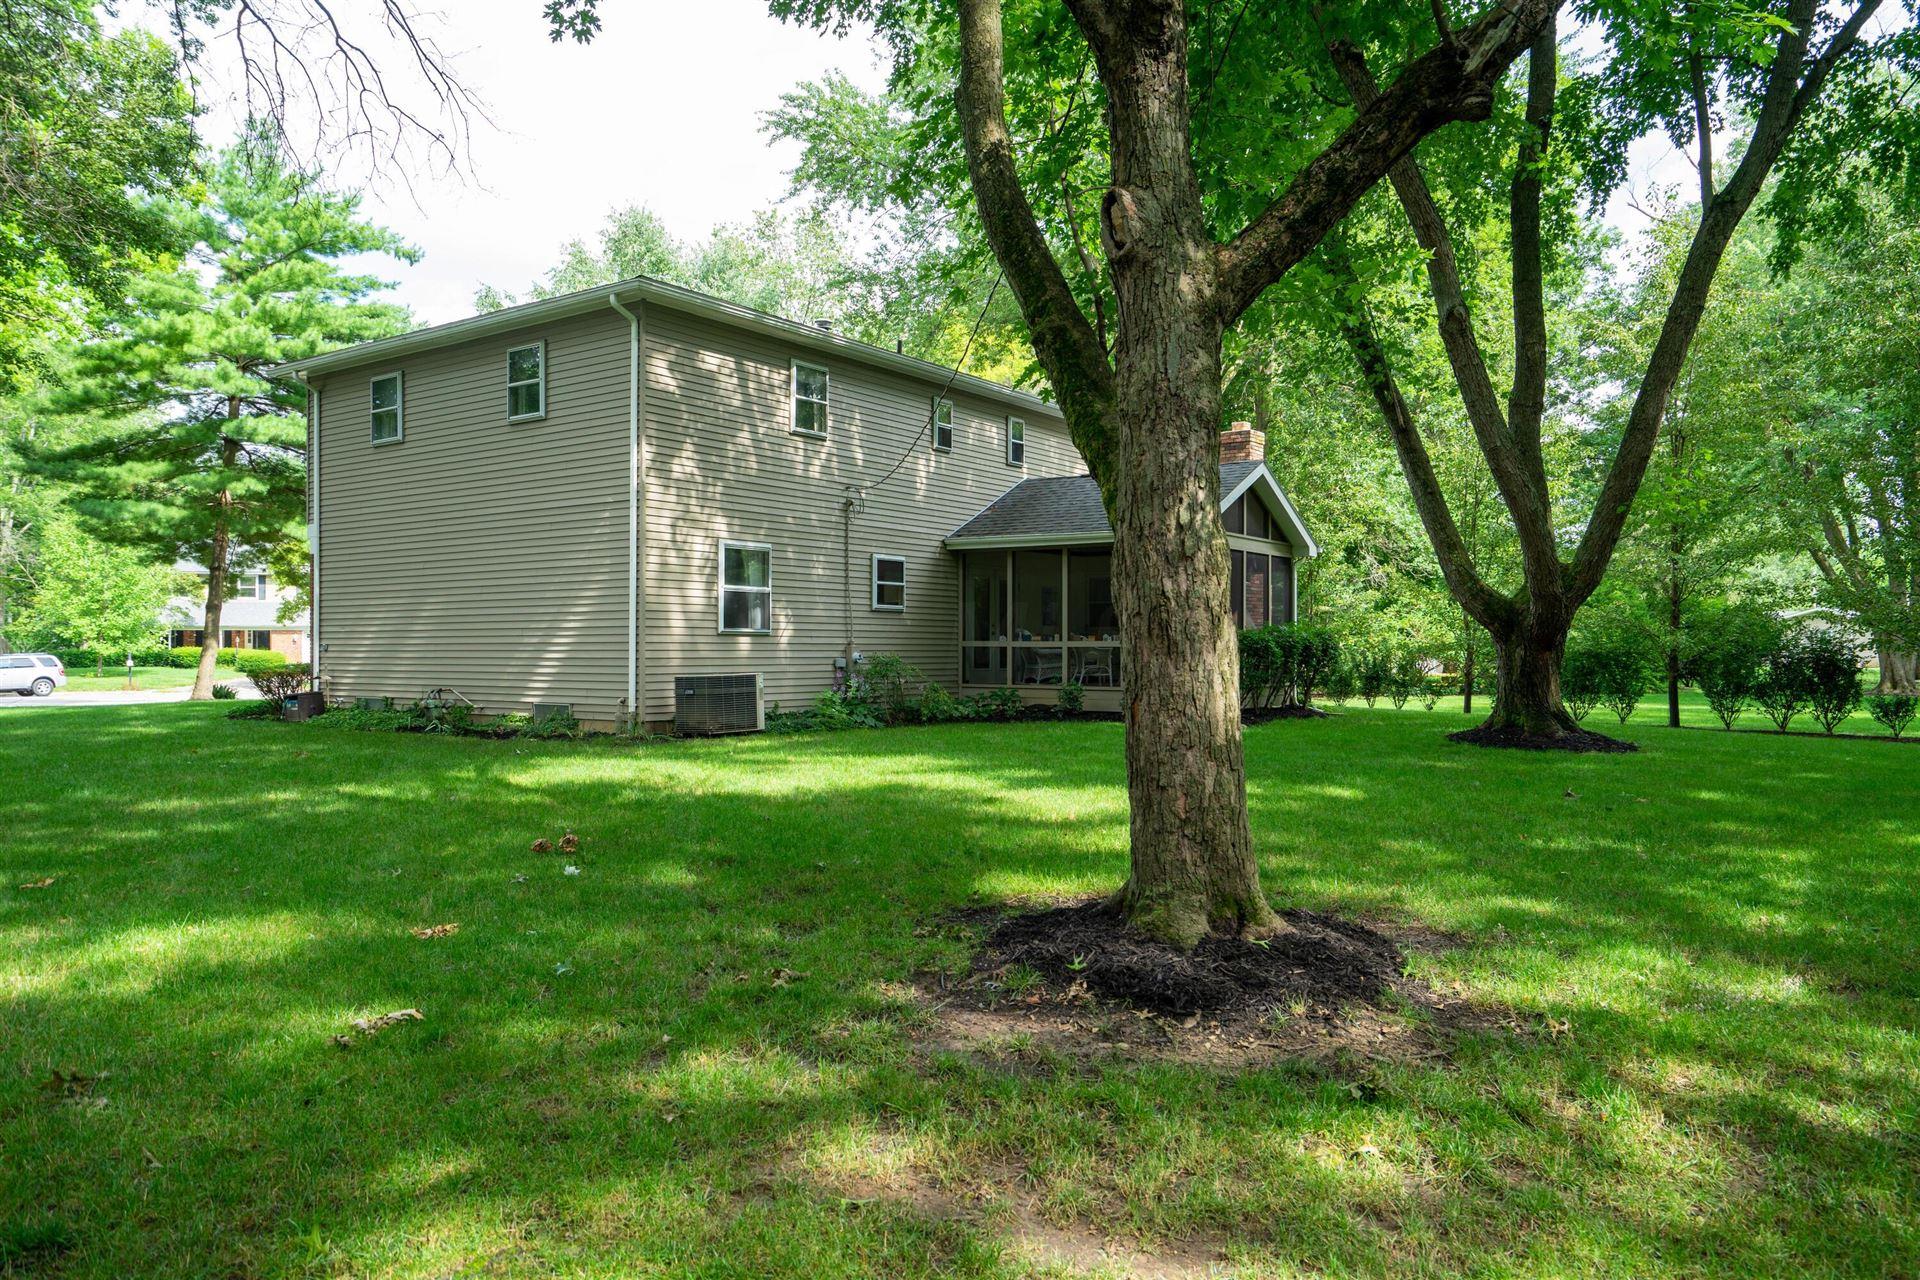 Photo of 6953 Village Woods Place, Worthington, OH 43085 (MLS # 221026393)